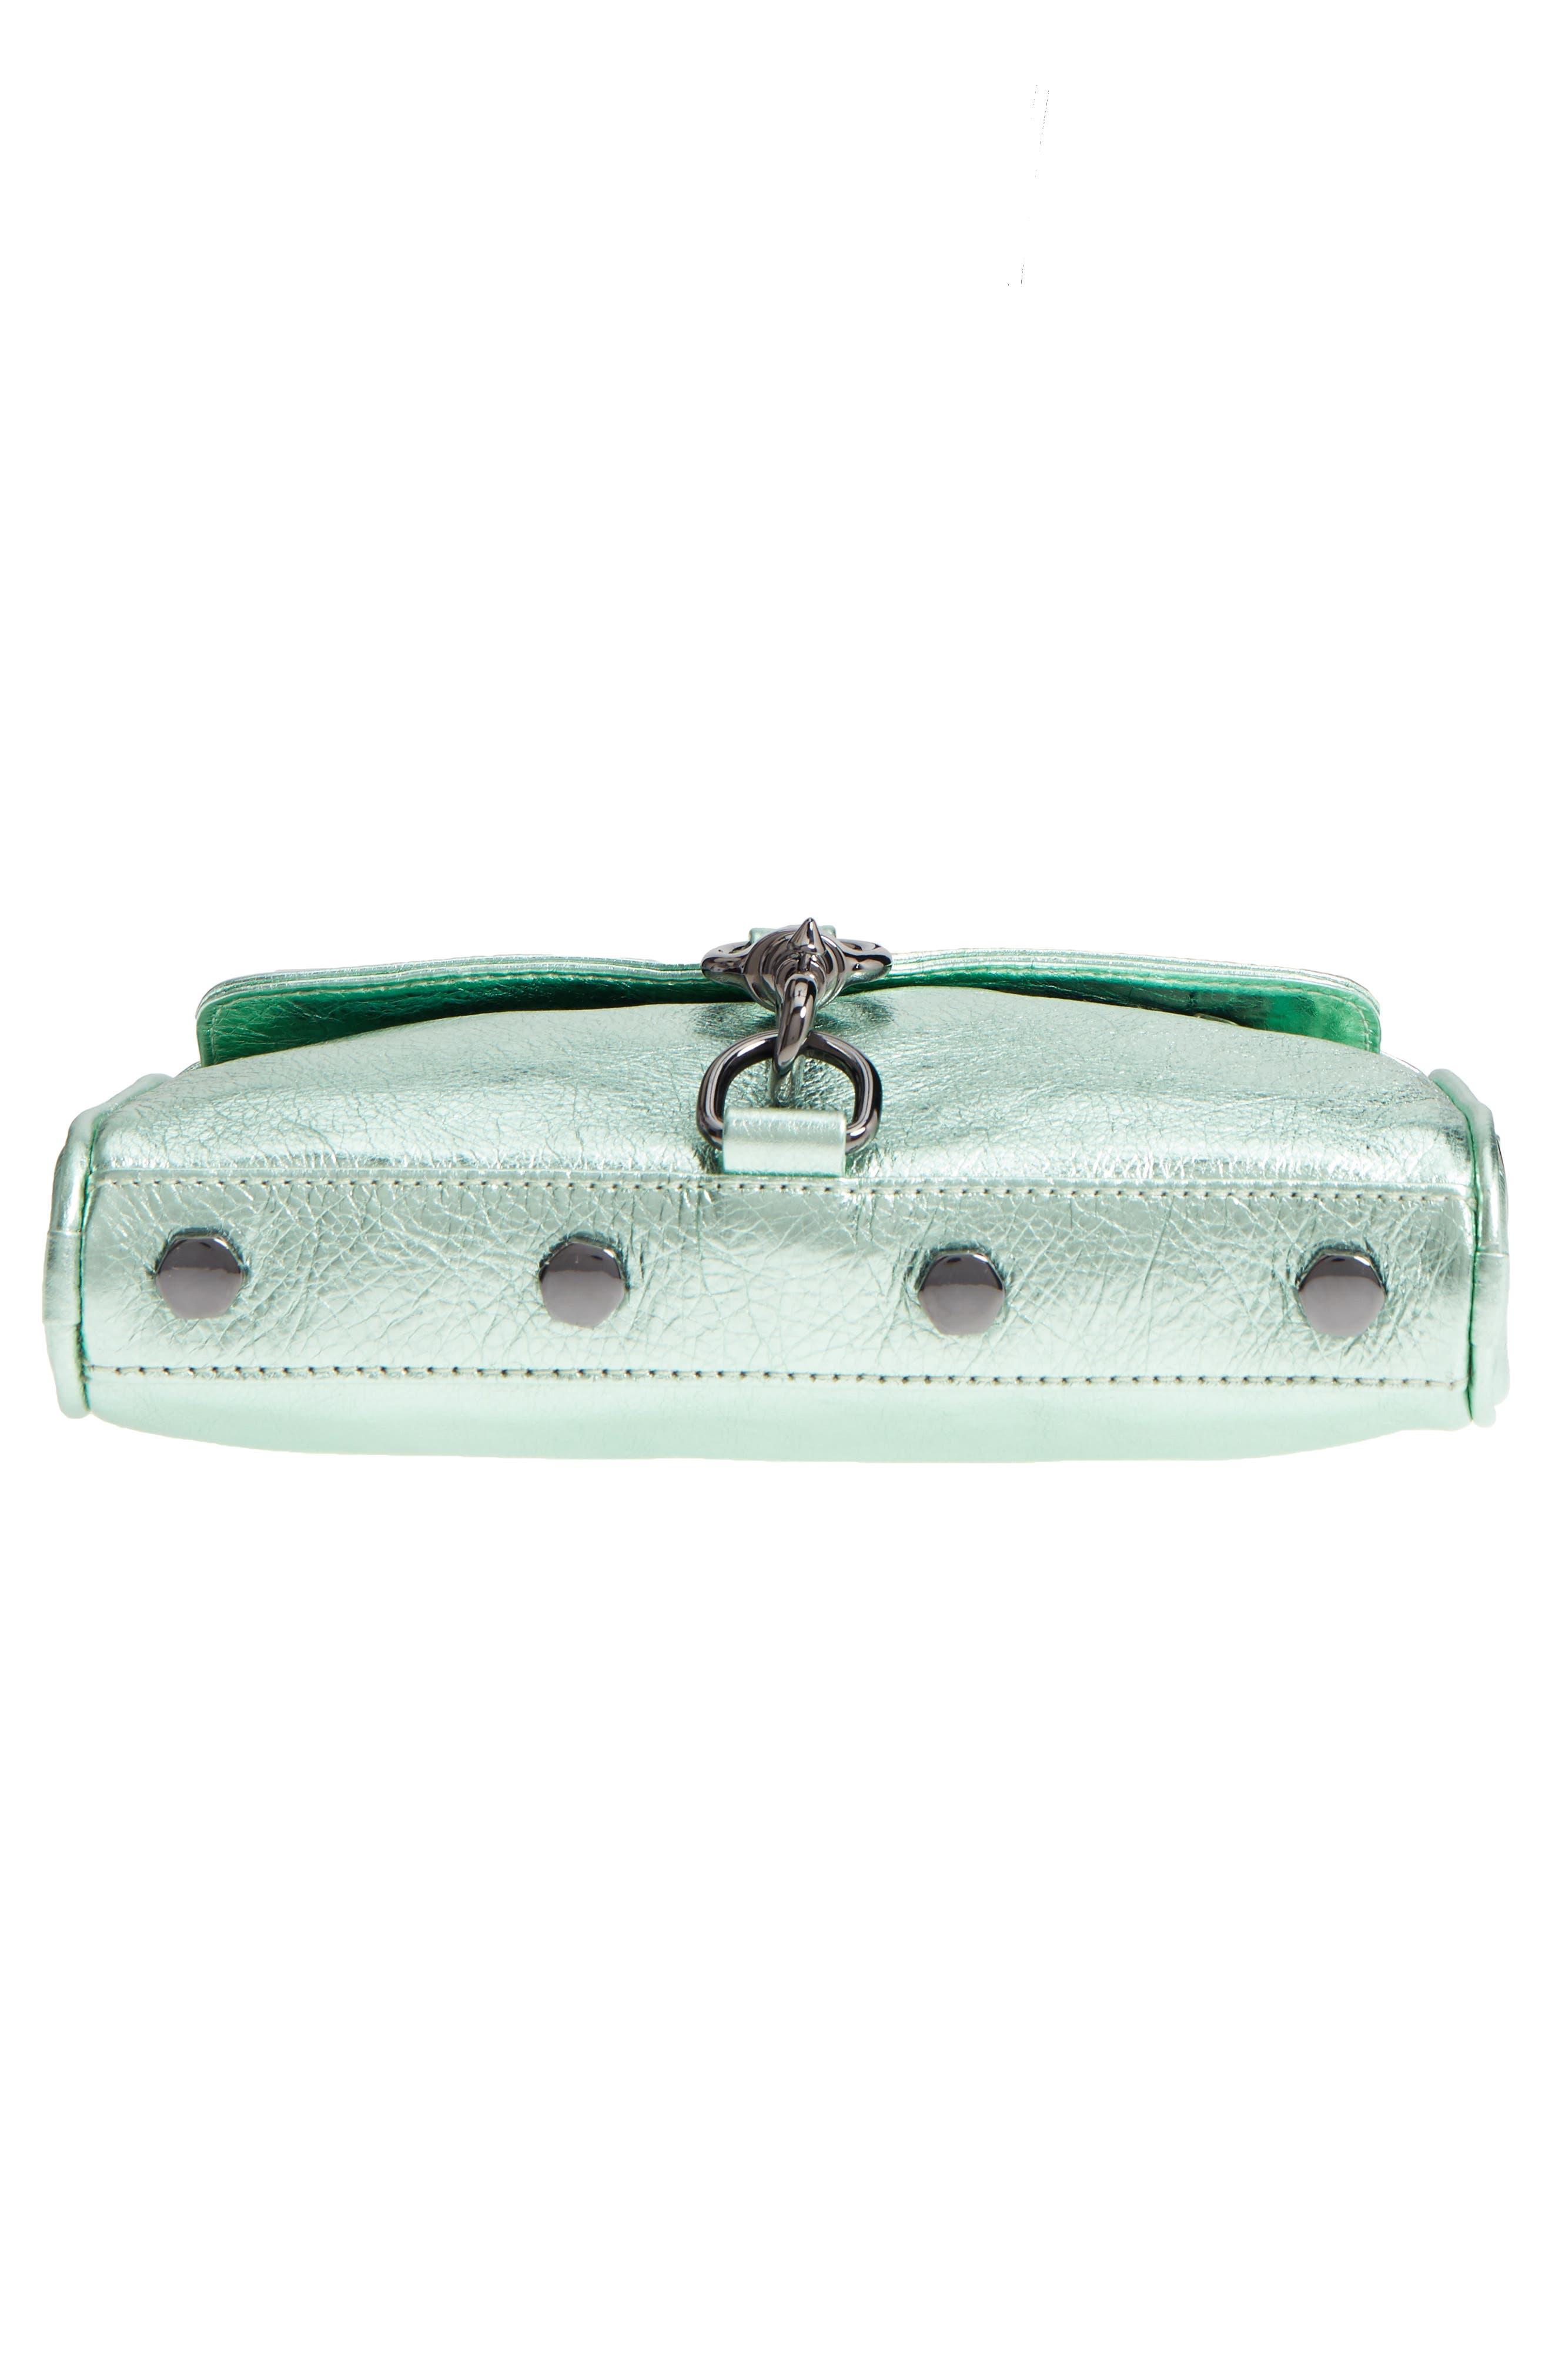 Mini MAC Metallic Leather Convertible Crossbody Bag,                             Alternate thumbnail 6, color,                             Mint